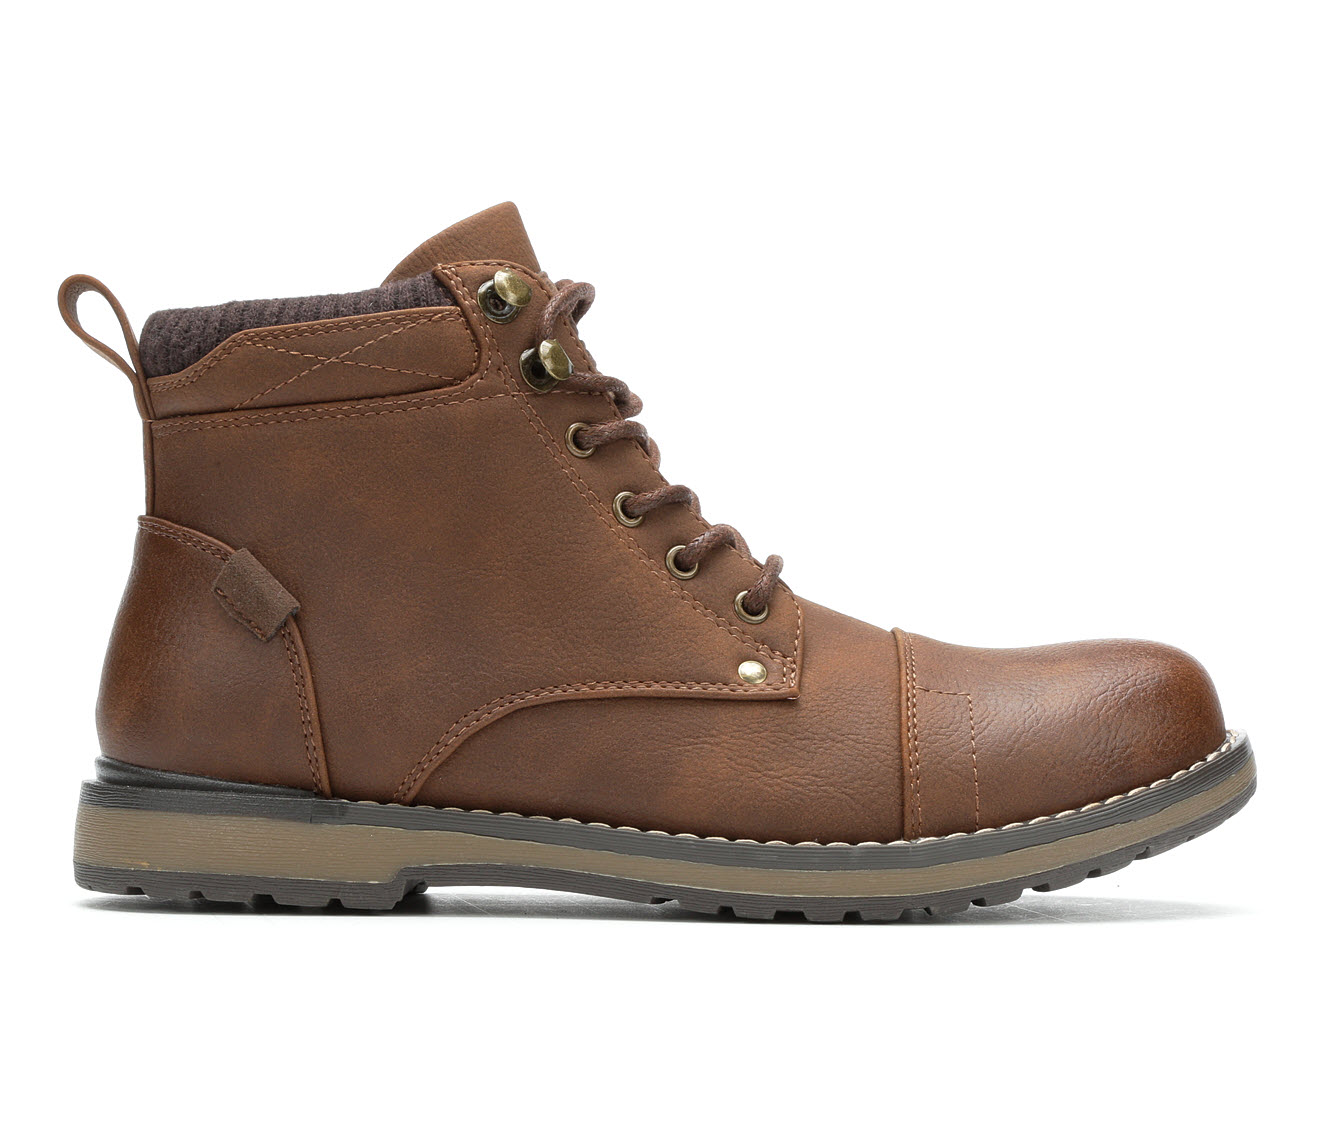 Gotcha Robertson Men's Boots (Brown Faux Leather)